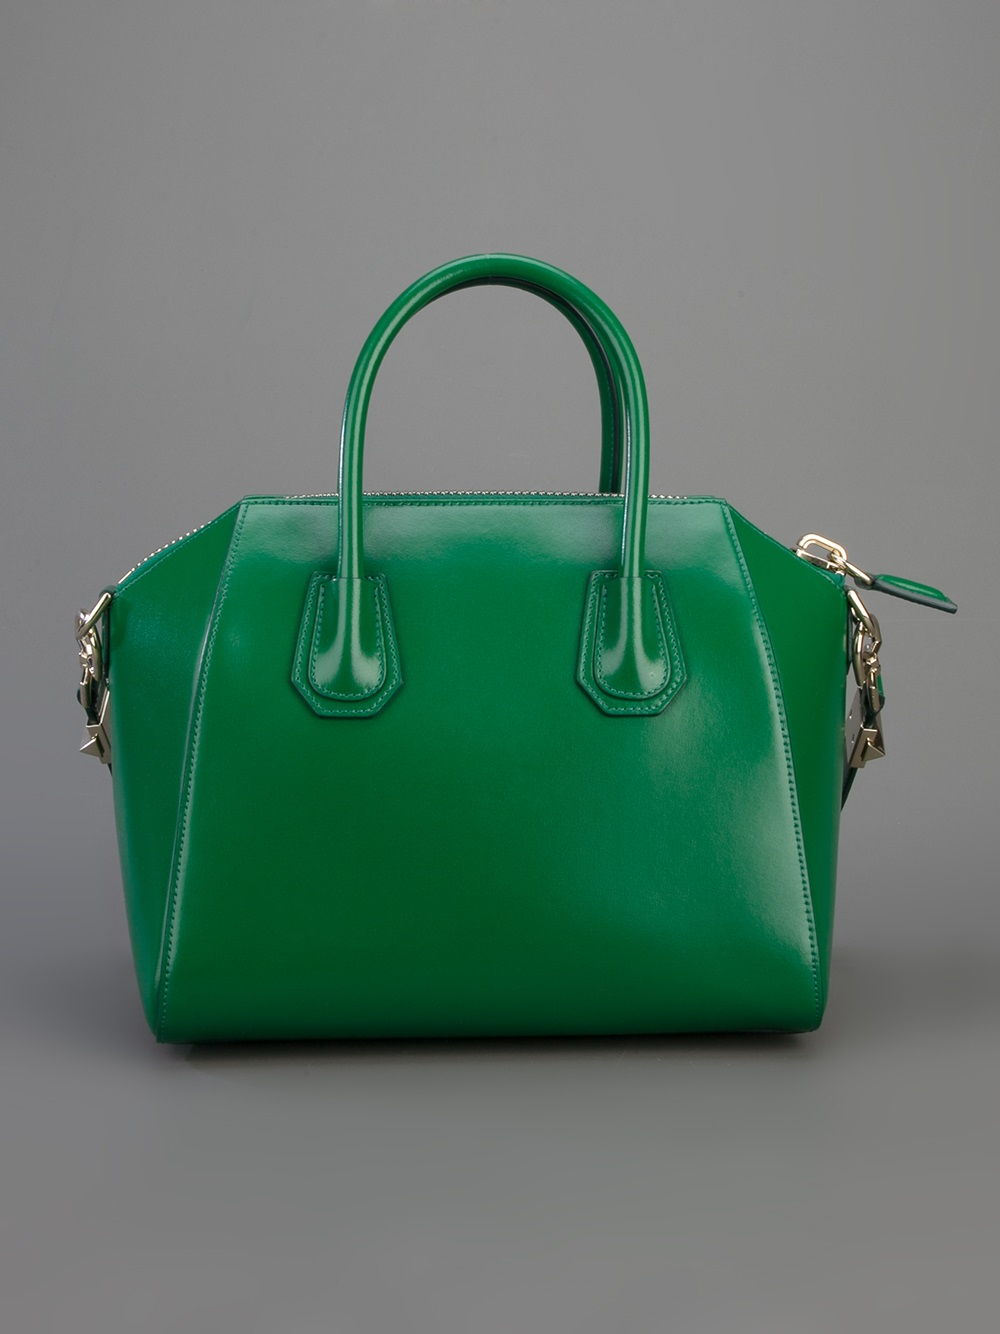 Givenchy Antigona Small Tote in Green